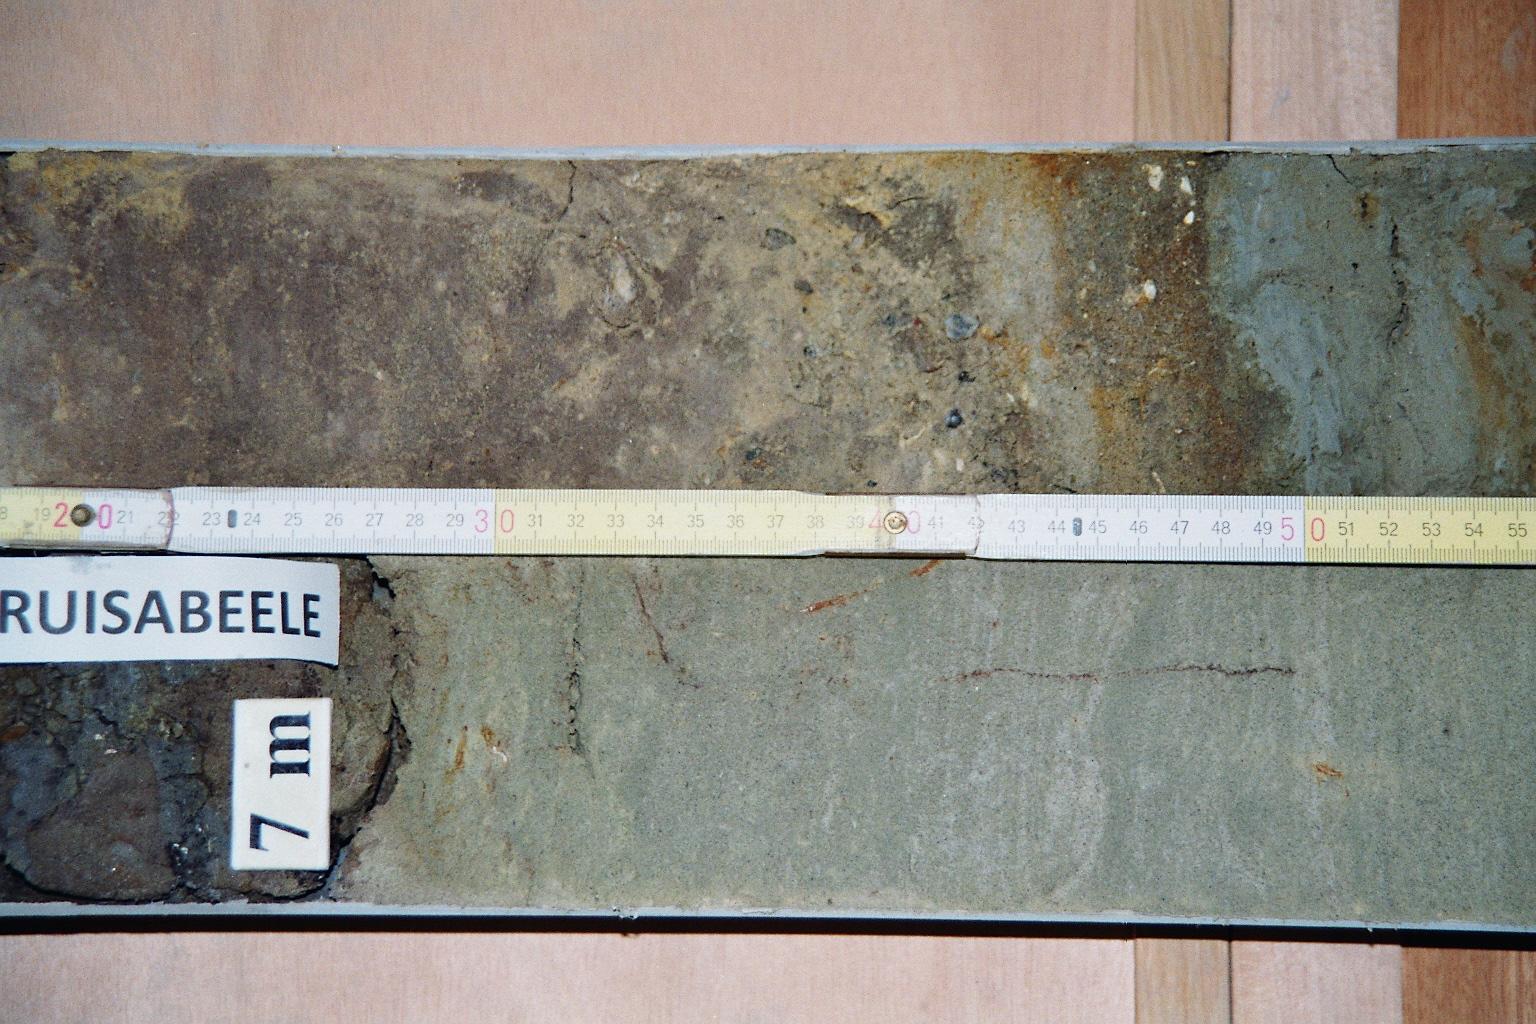 051w0136-kruisabeele-large12.jpg